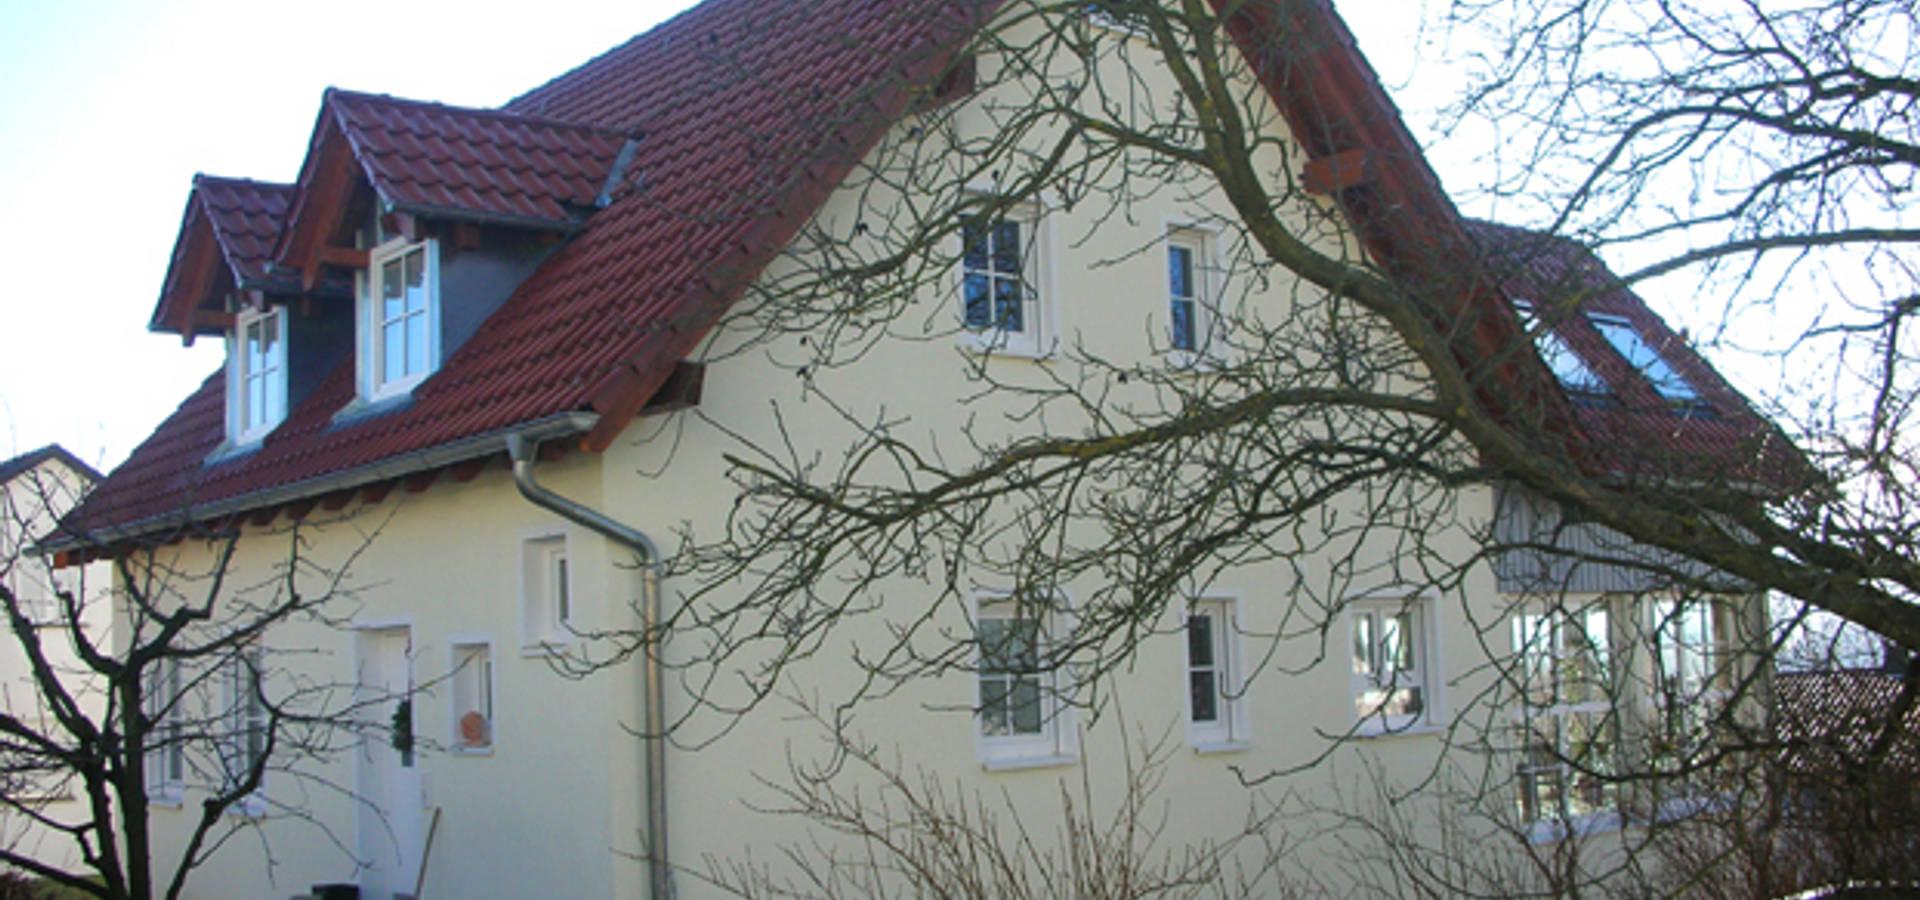 Architekturbüro Kaden